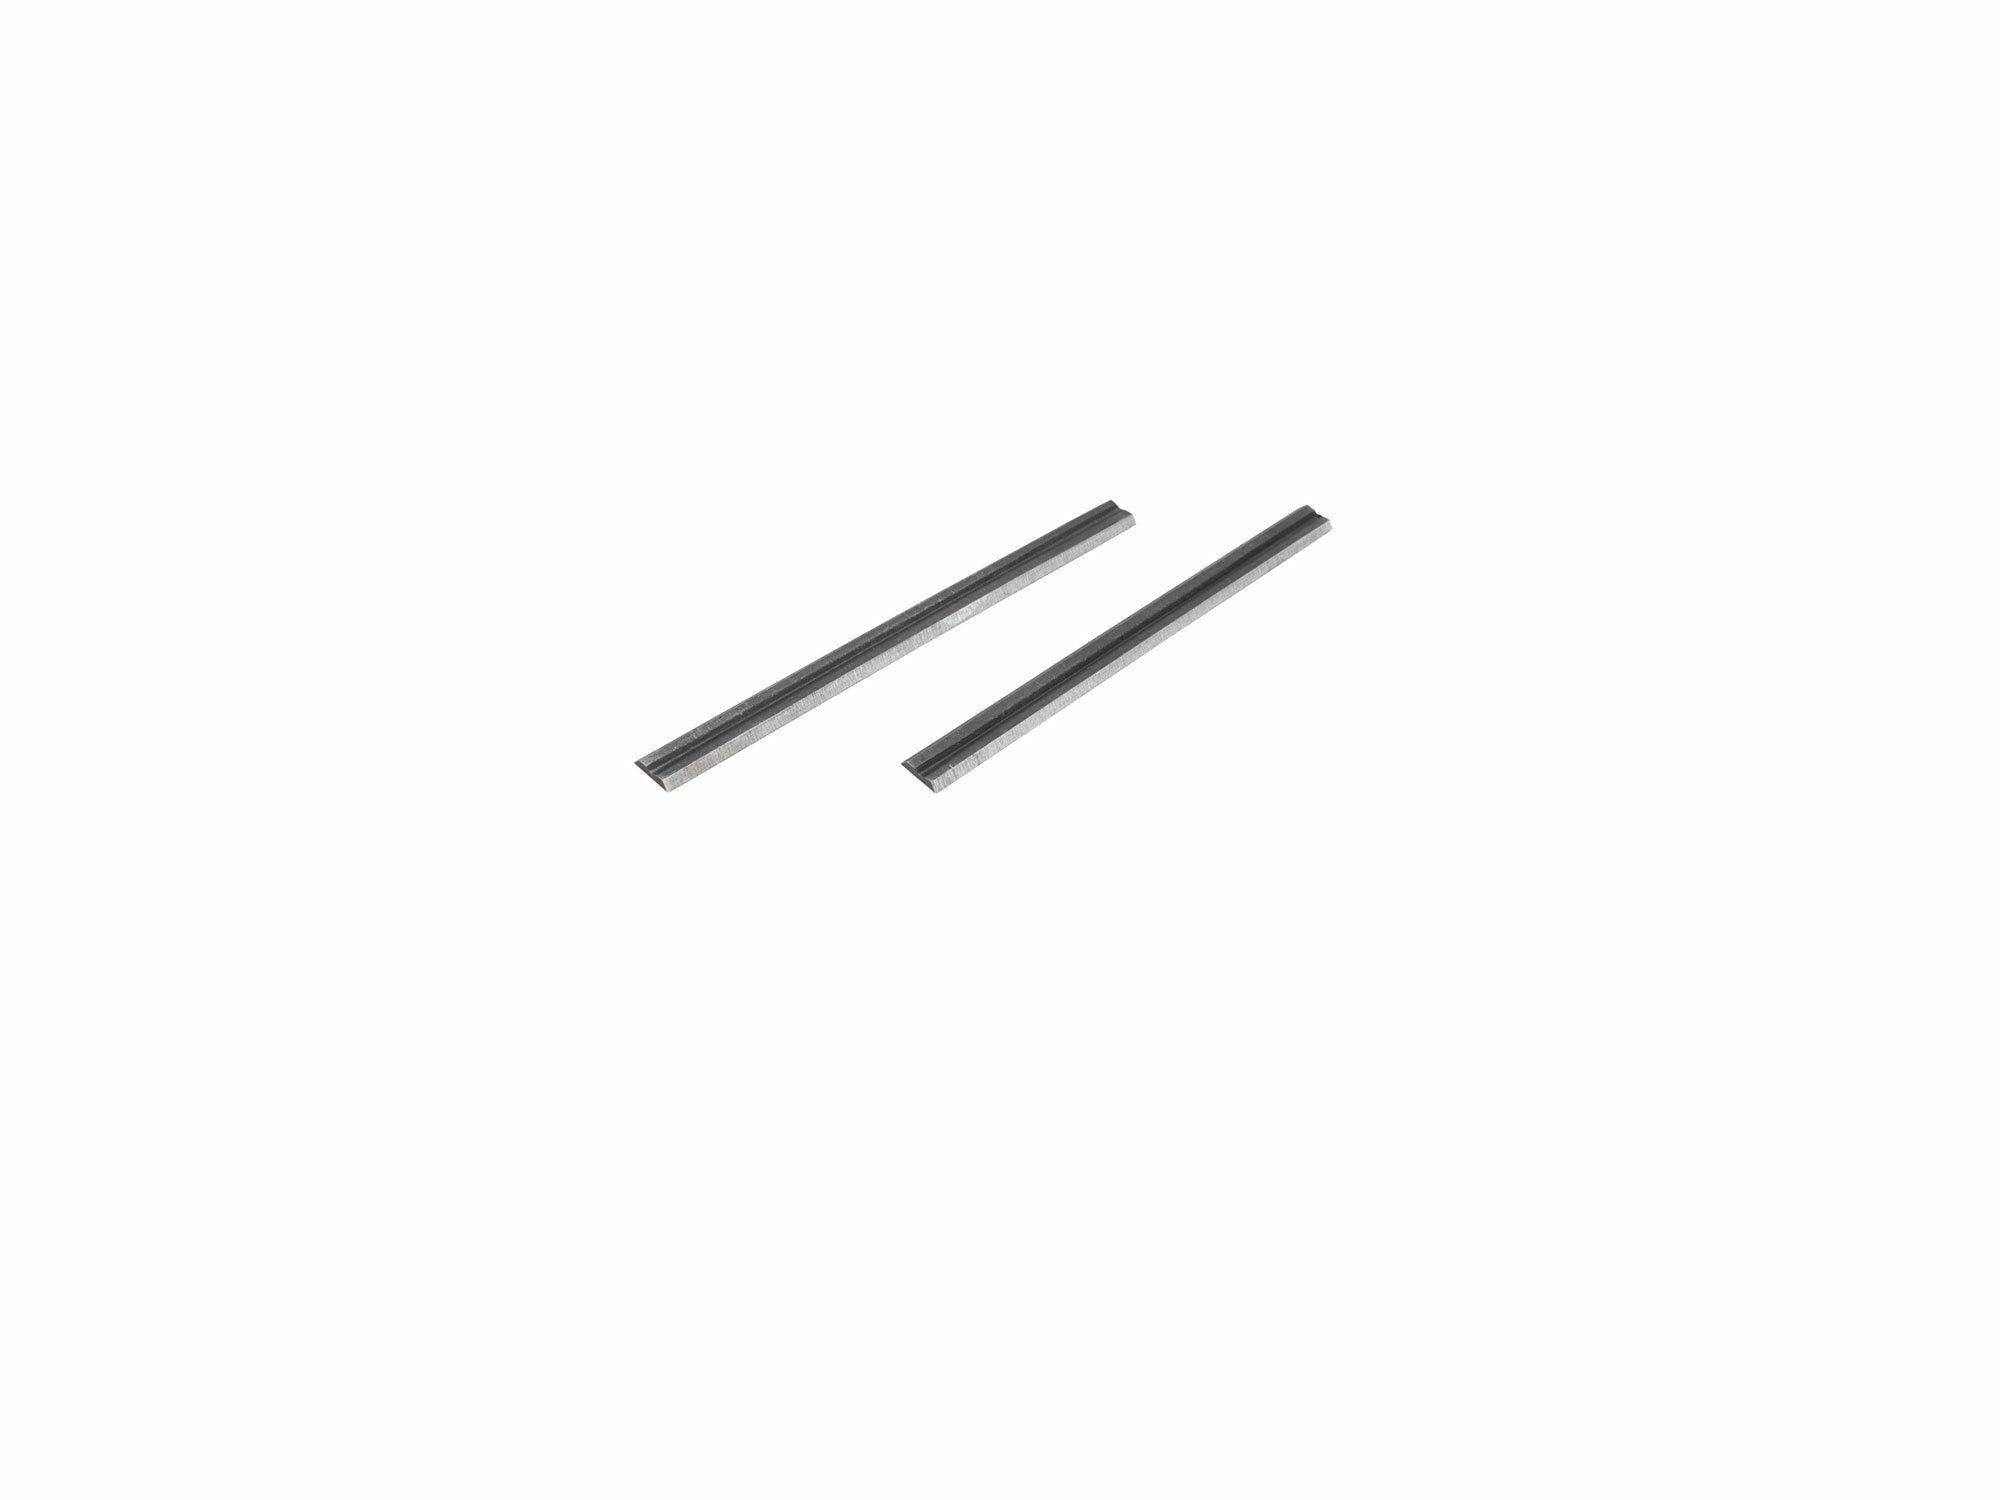 HSS hoblovací nože 2ks, 82x5,7x1mm, pro 8893402, EXTOL PREMIUM